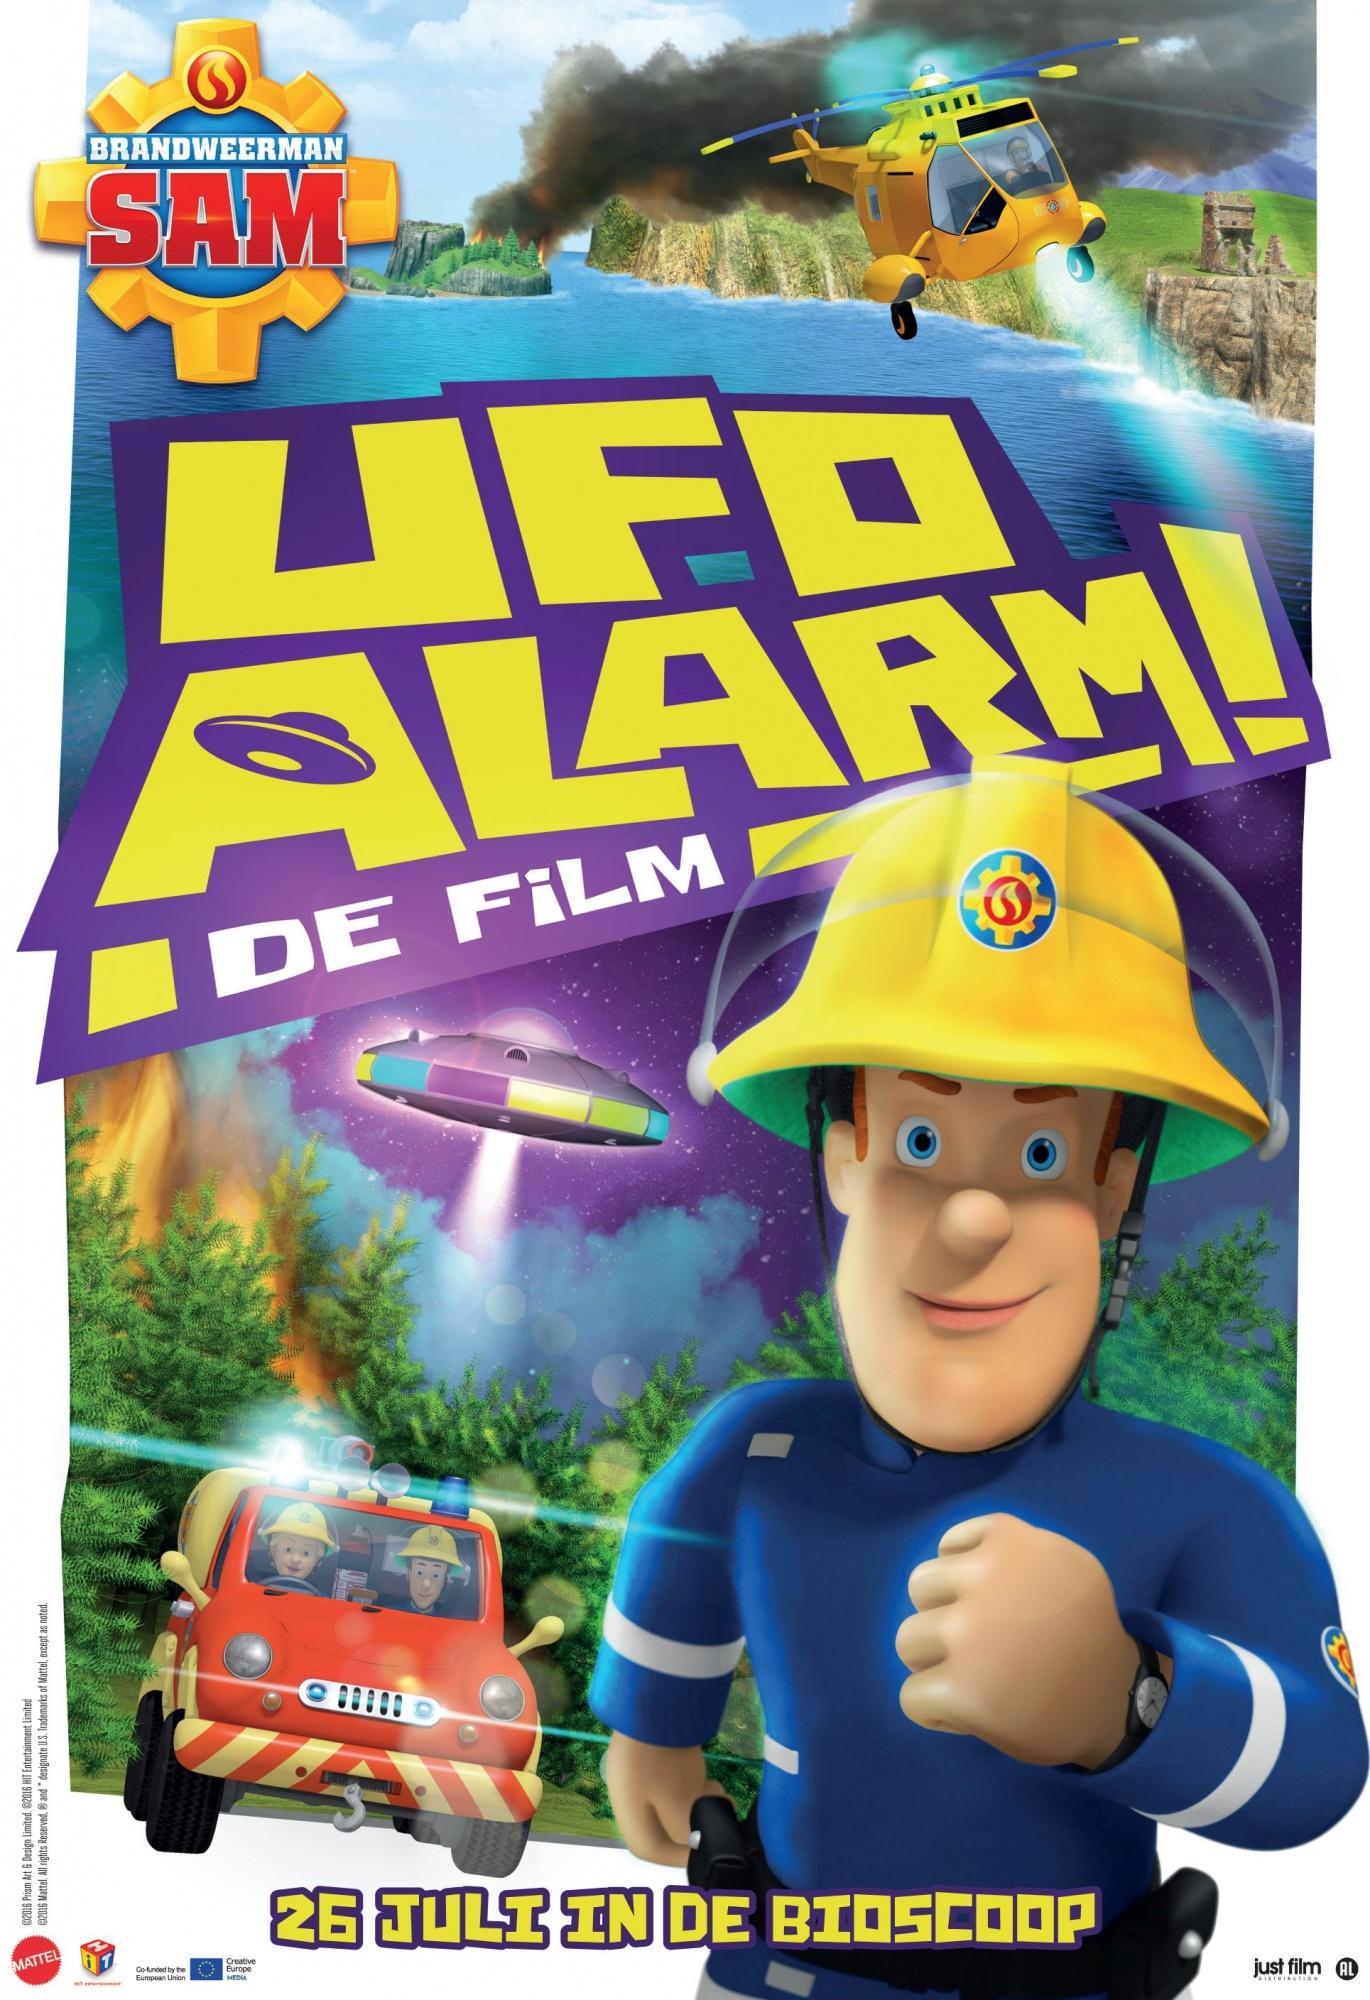 Populair Brandweerman Sam DVD UFO Alarm! - the film - Internet-Toys @QA39